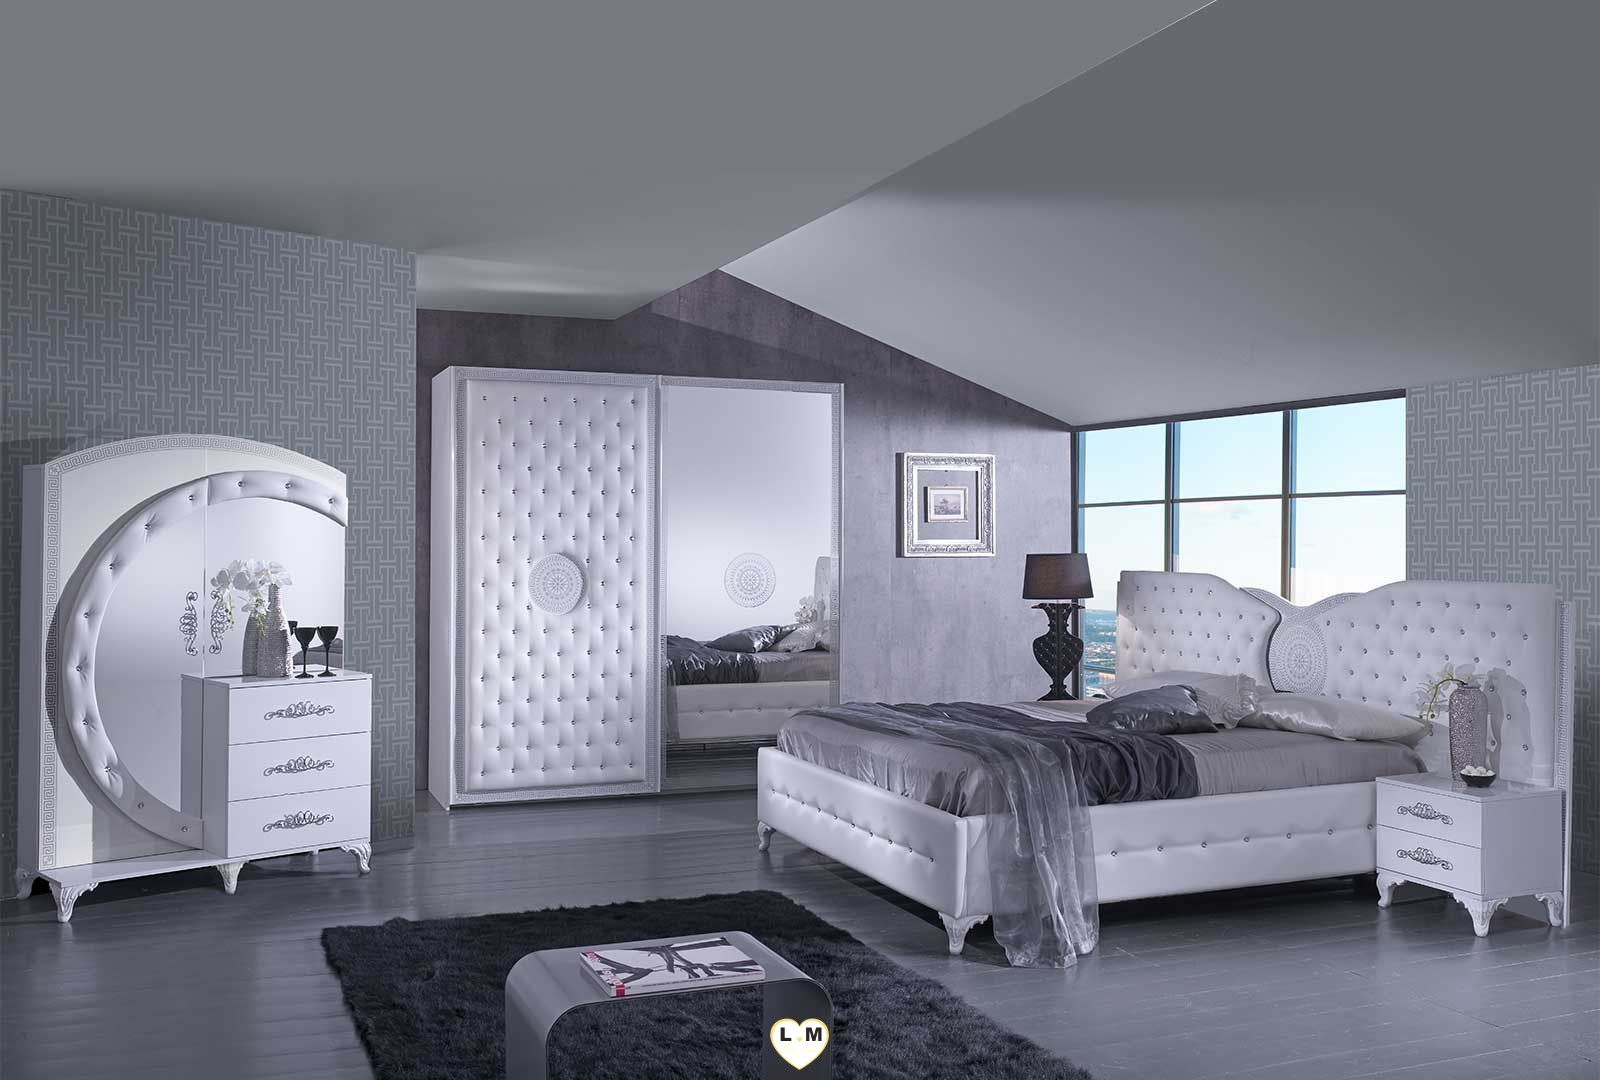 Tana blanc composition ensemble meuble chambre a coucher for Meuble chambre a coucher